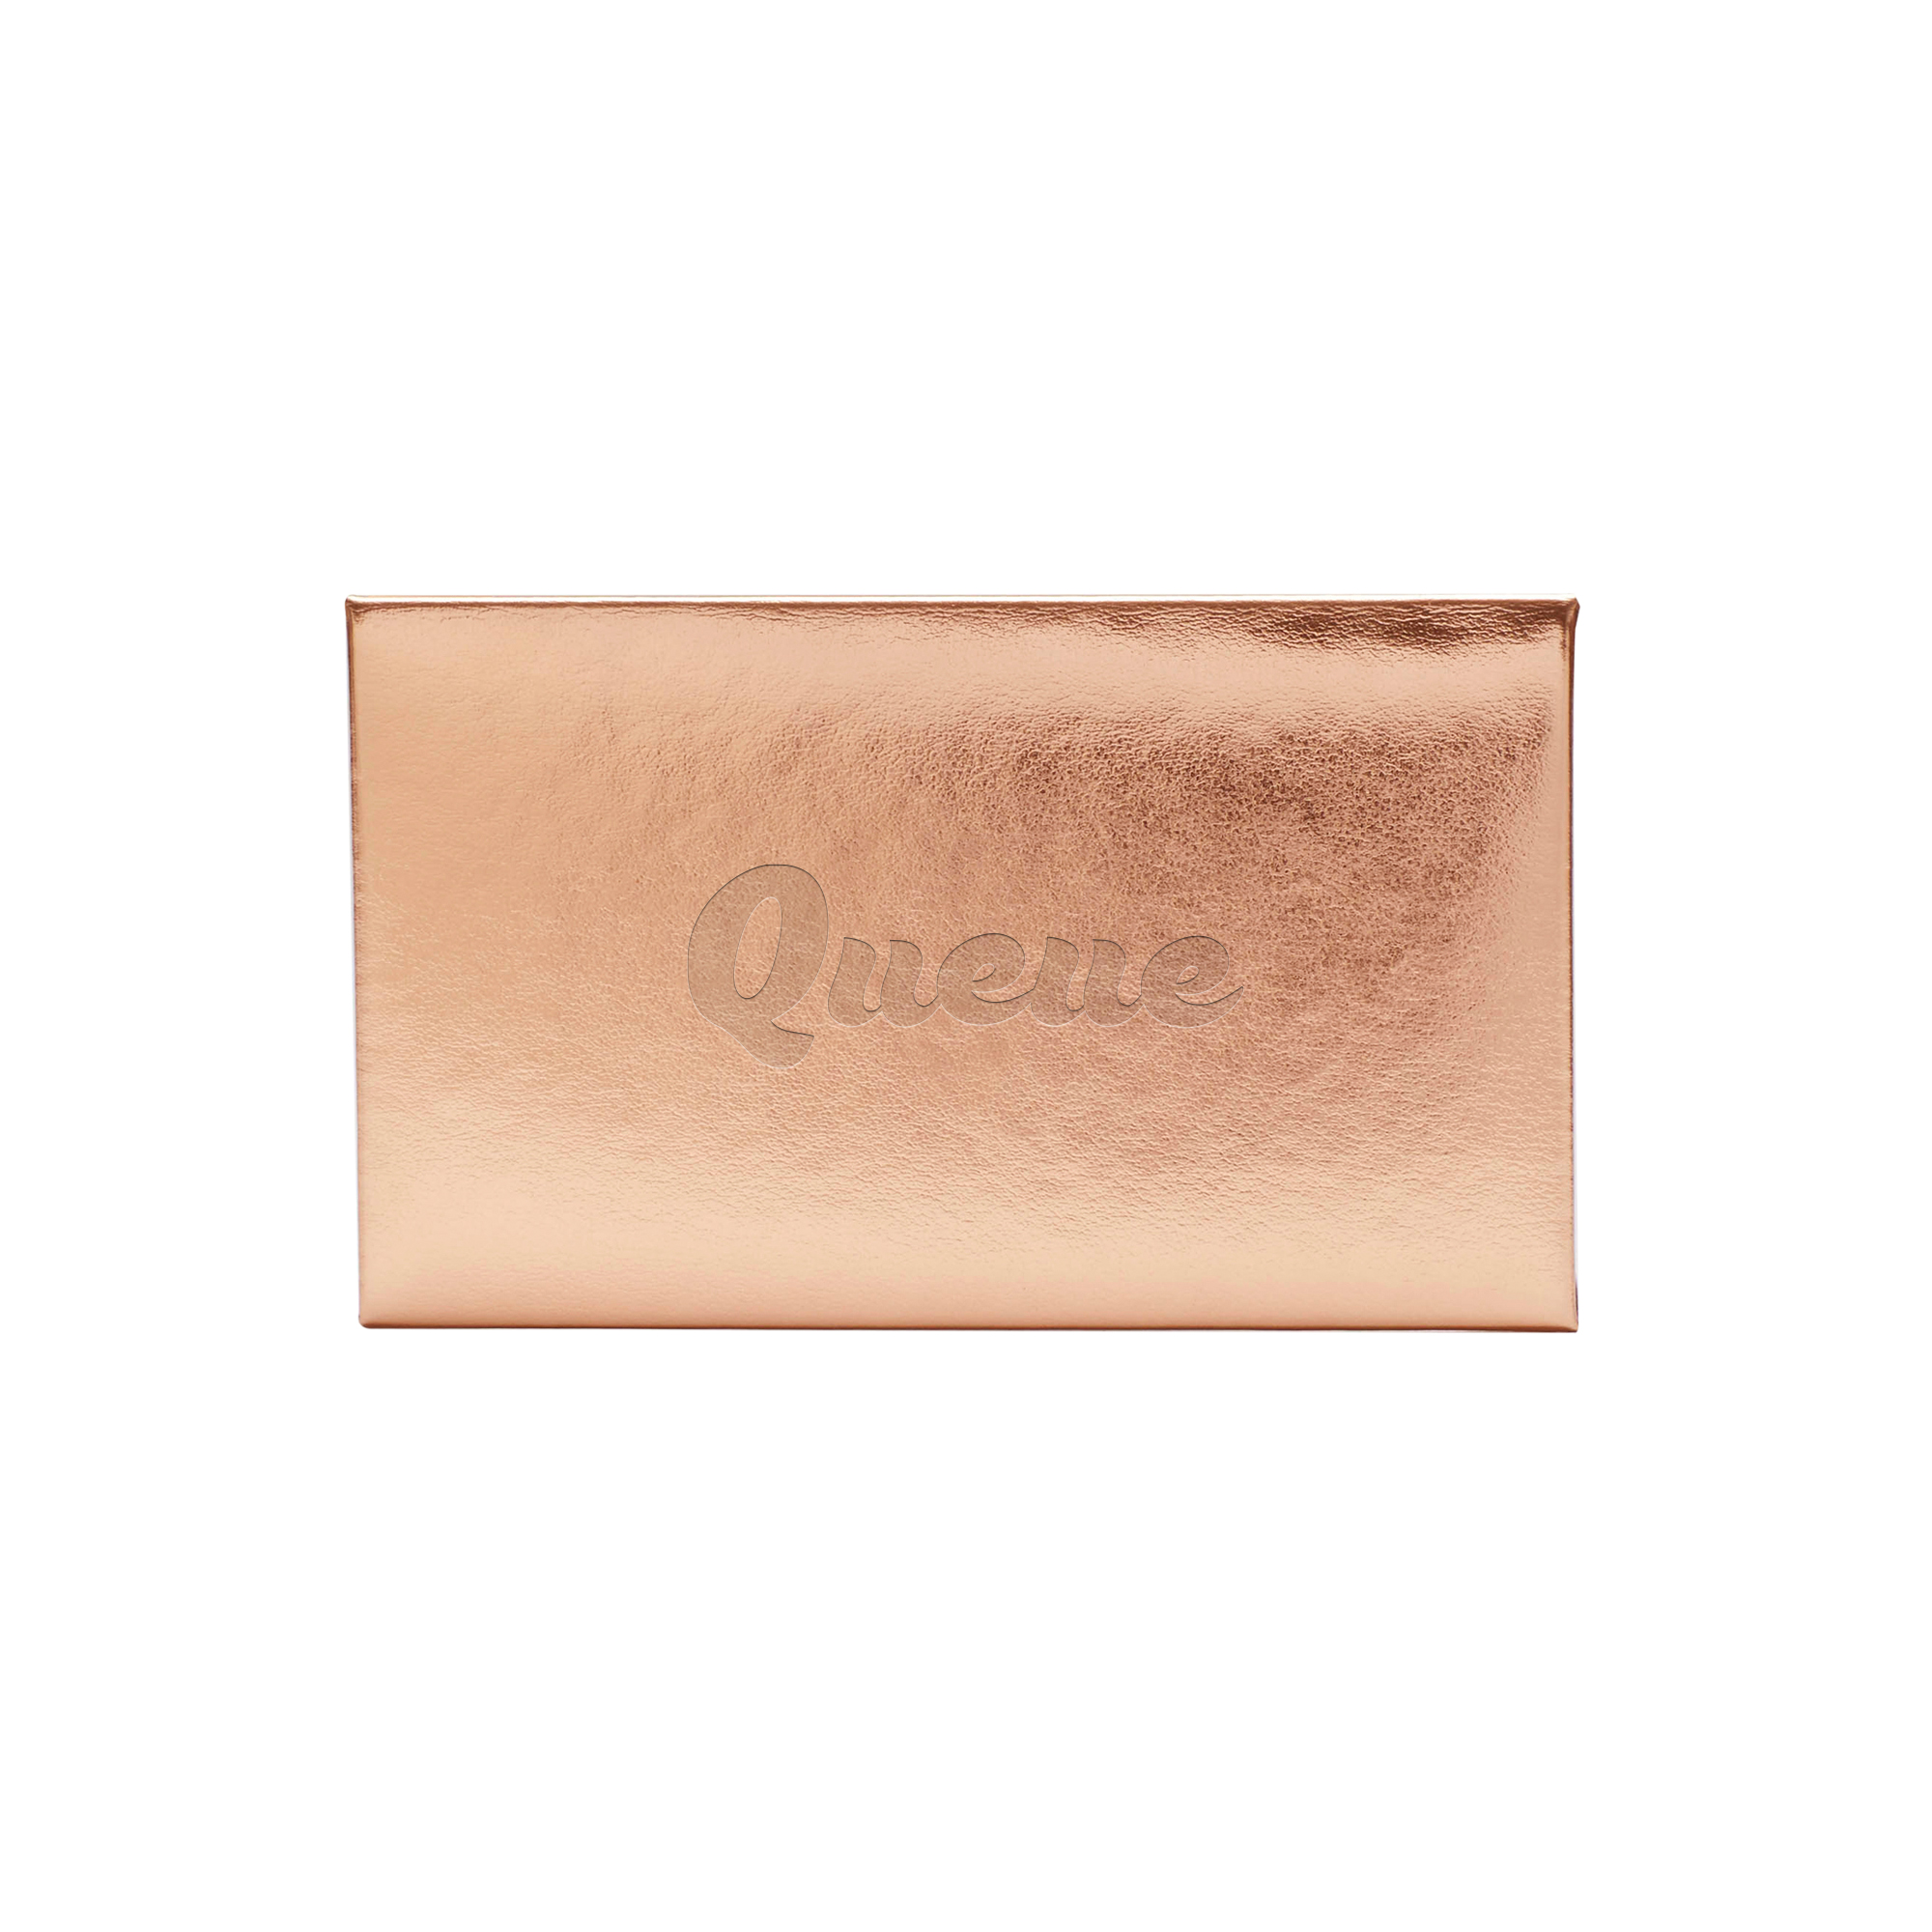 Custom Copper Card Case | Desk Accessories & Organization | Poppin